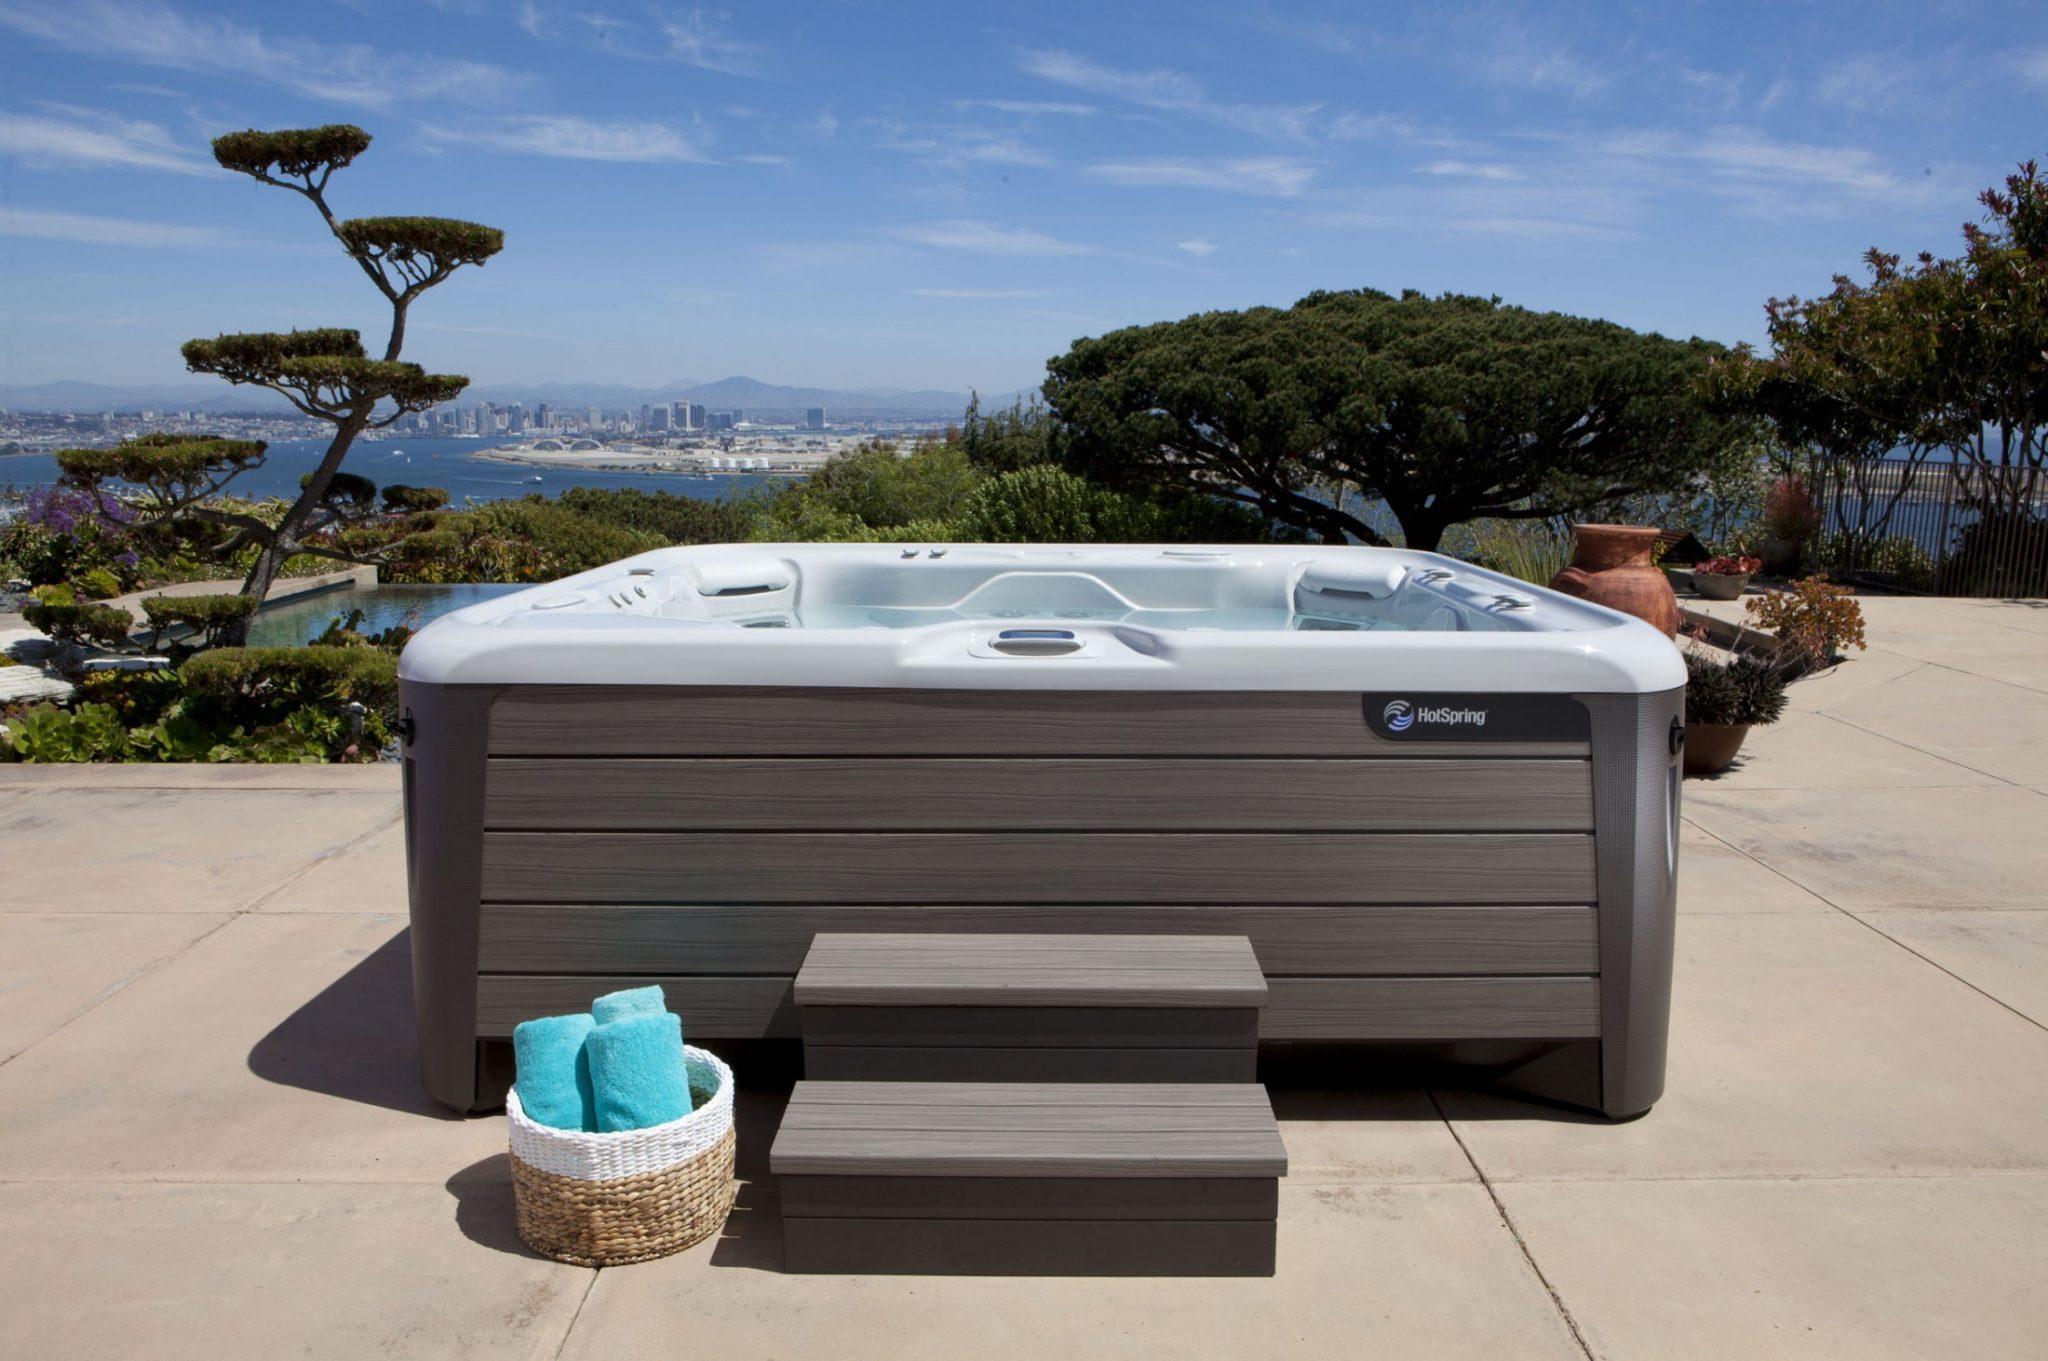 Hot-Spring-Highlife-2014-Grandee-NXT-Ice-Gray-Monteray-Gray-Lifestyle-Spa-Alone-01-2200x1462 Наружные SPA ванны